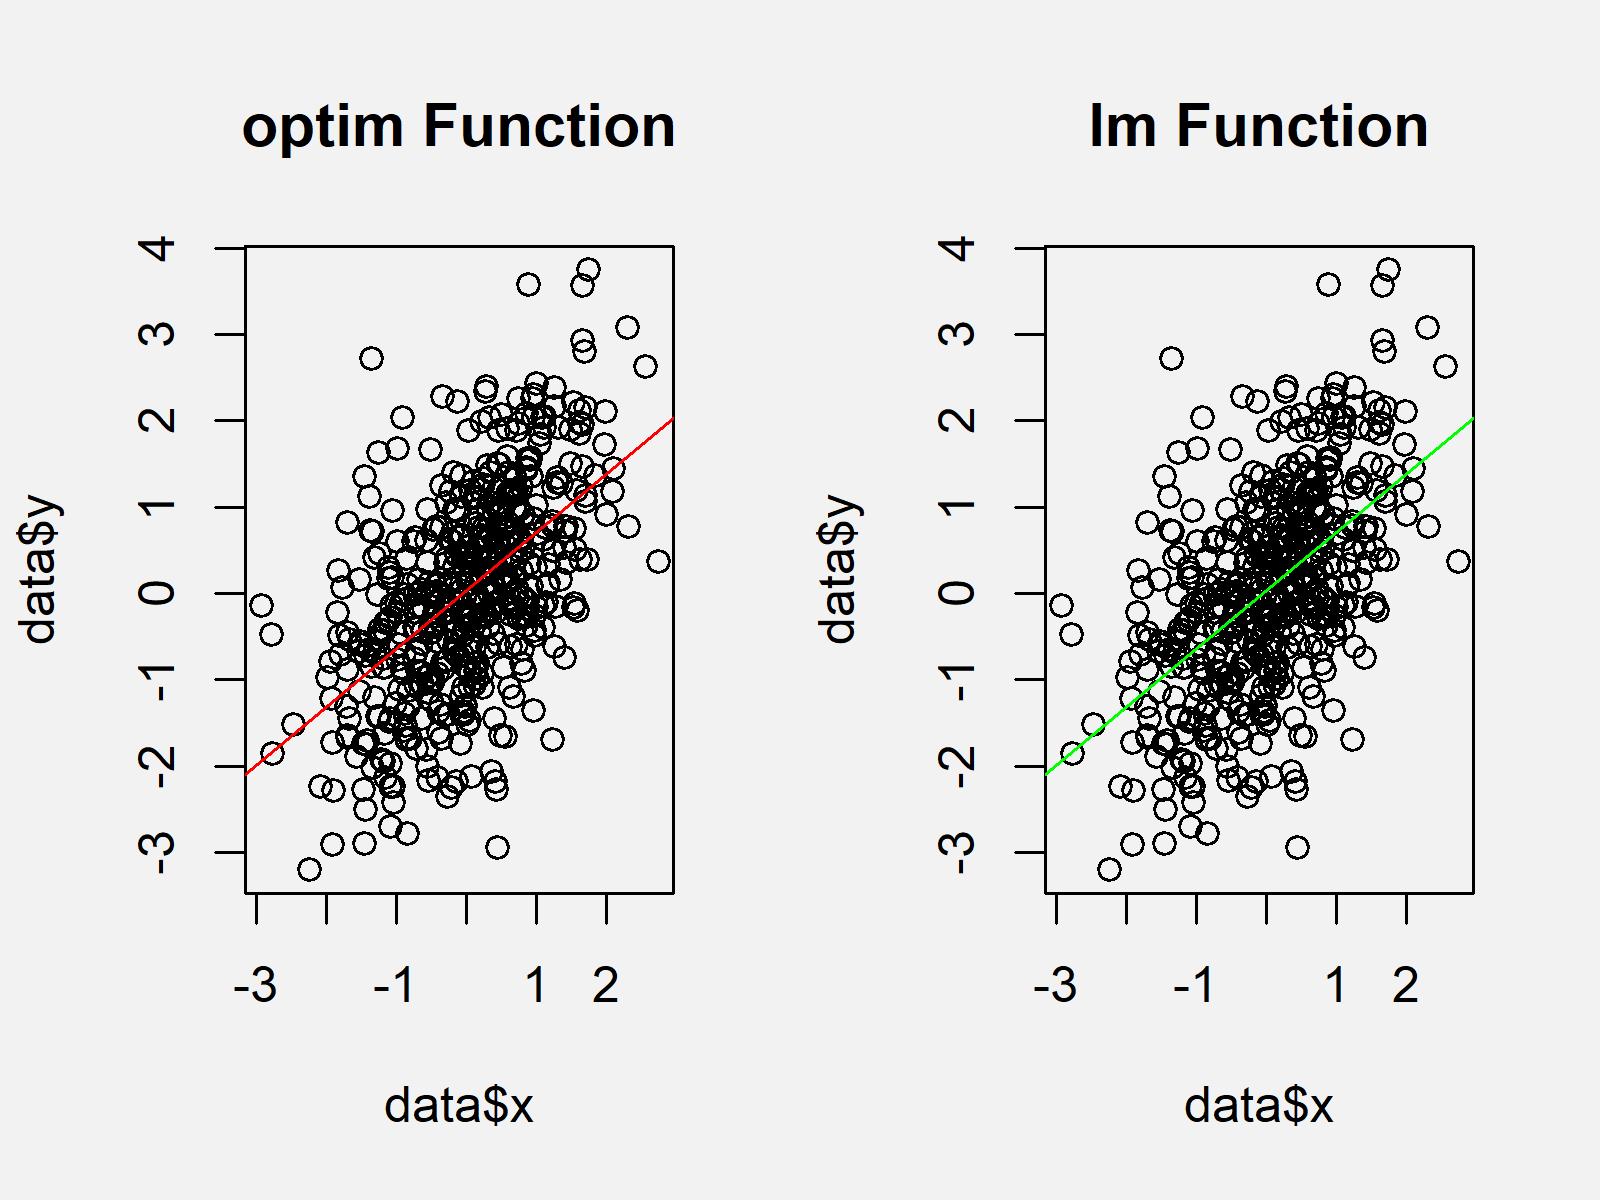 r graph figure 1 optim function